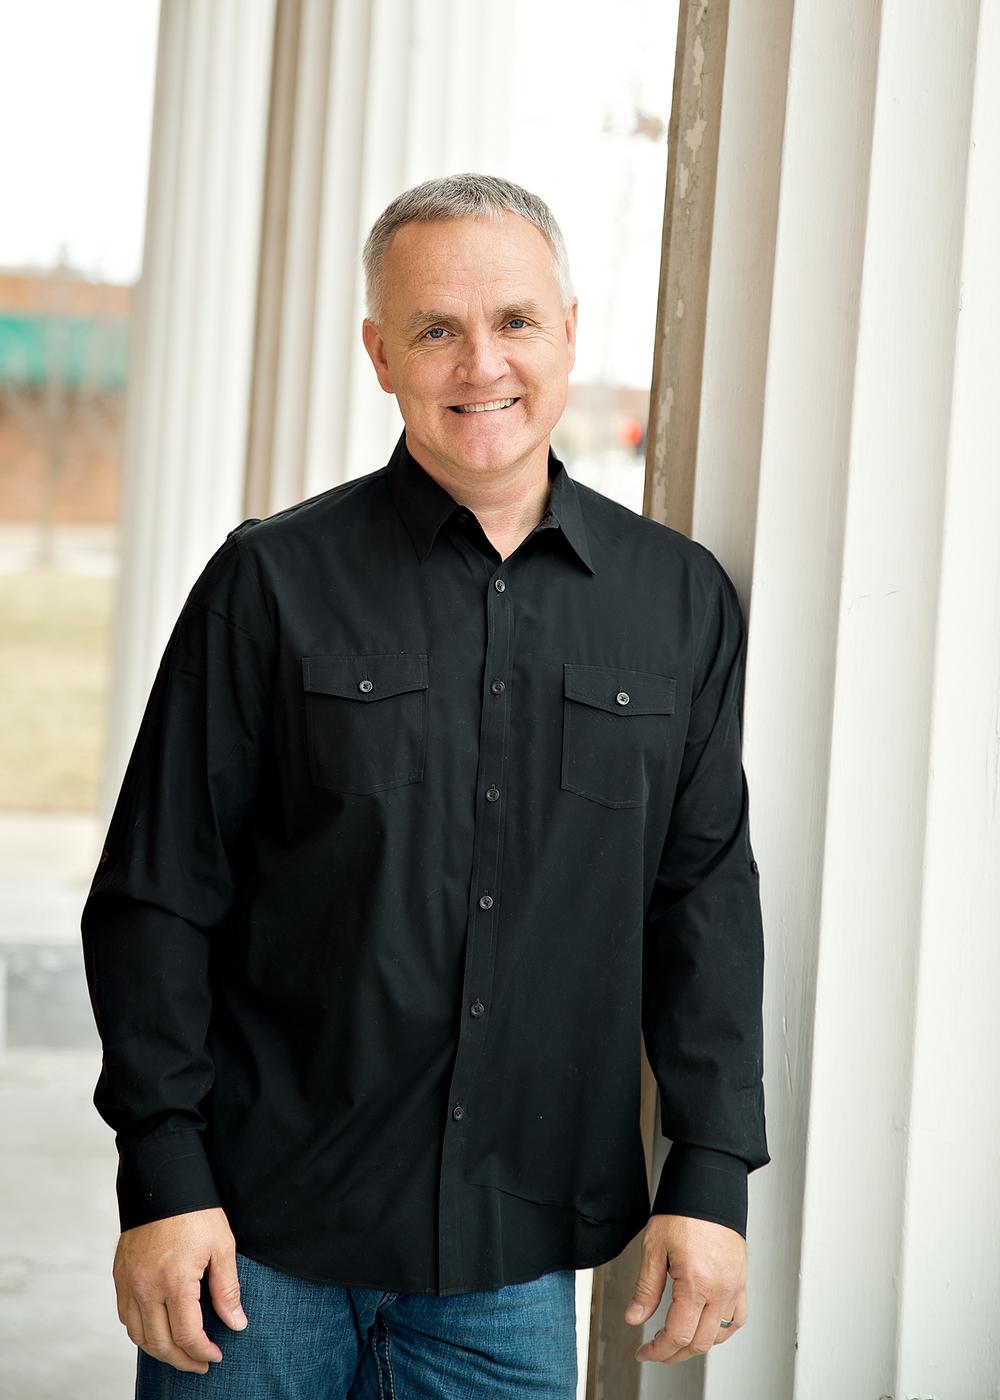 Pastor Doug McAllister